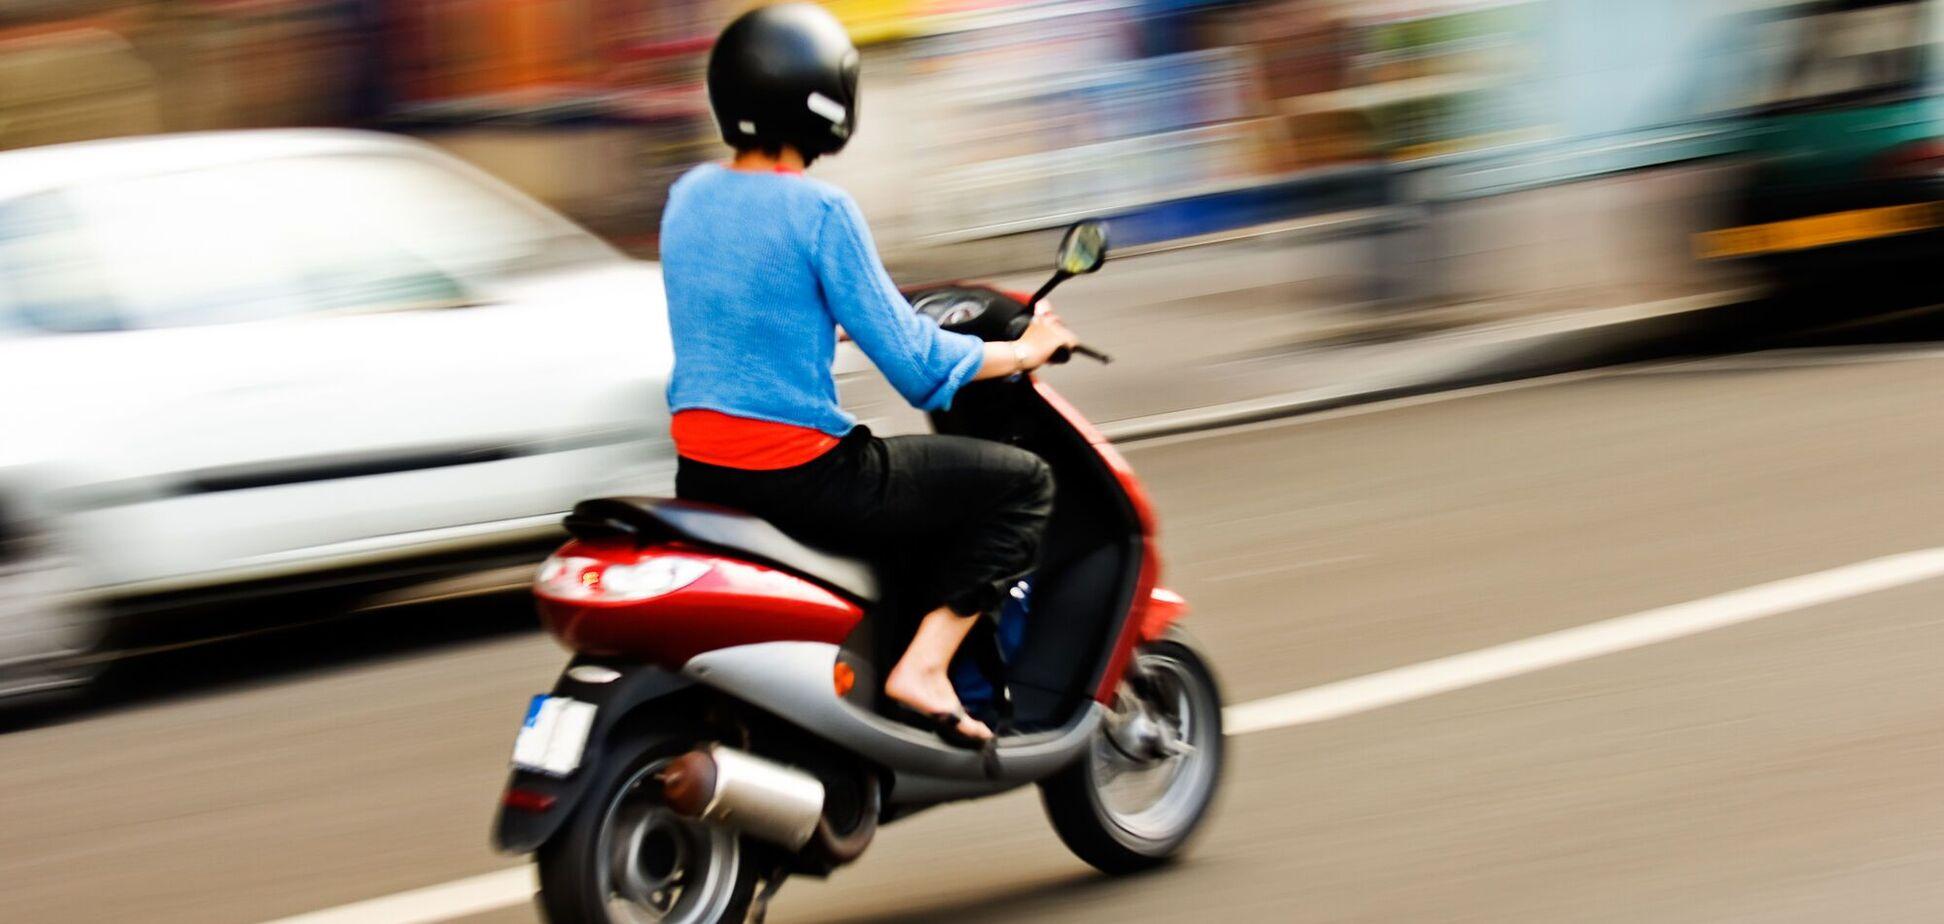 В Днепре подросток на скутере сбил ребенка. Видео